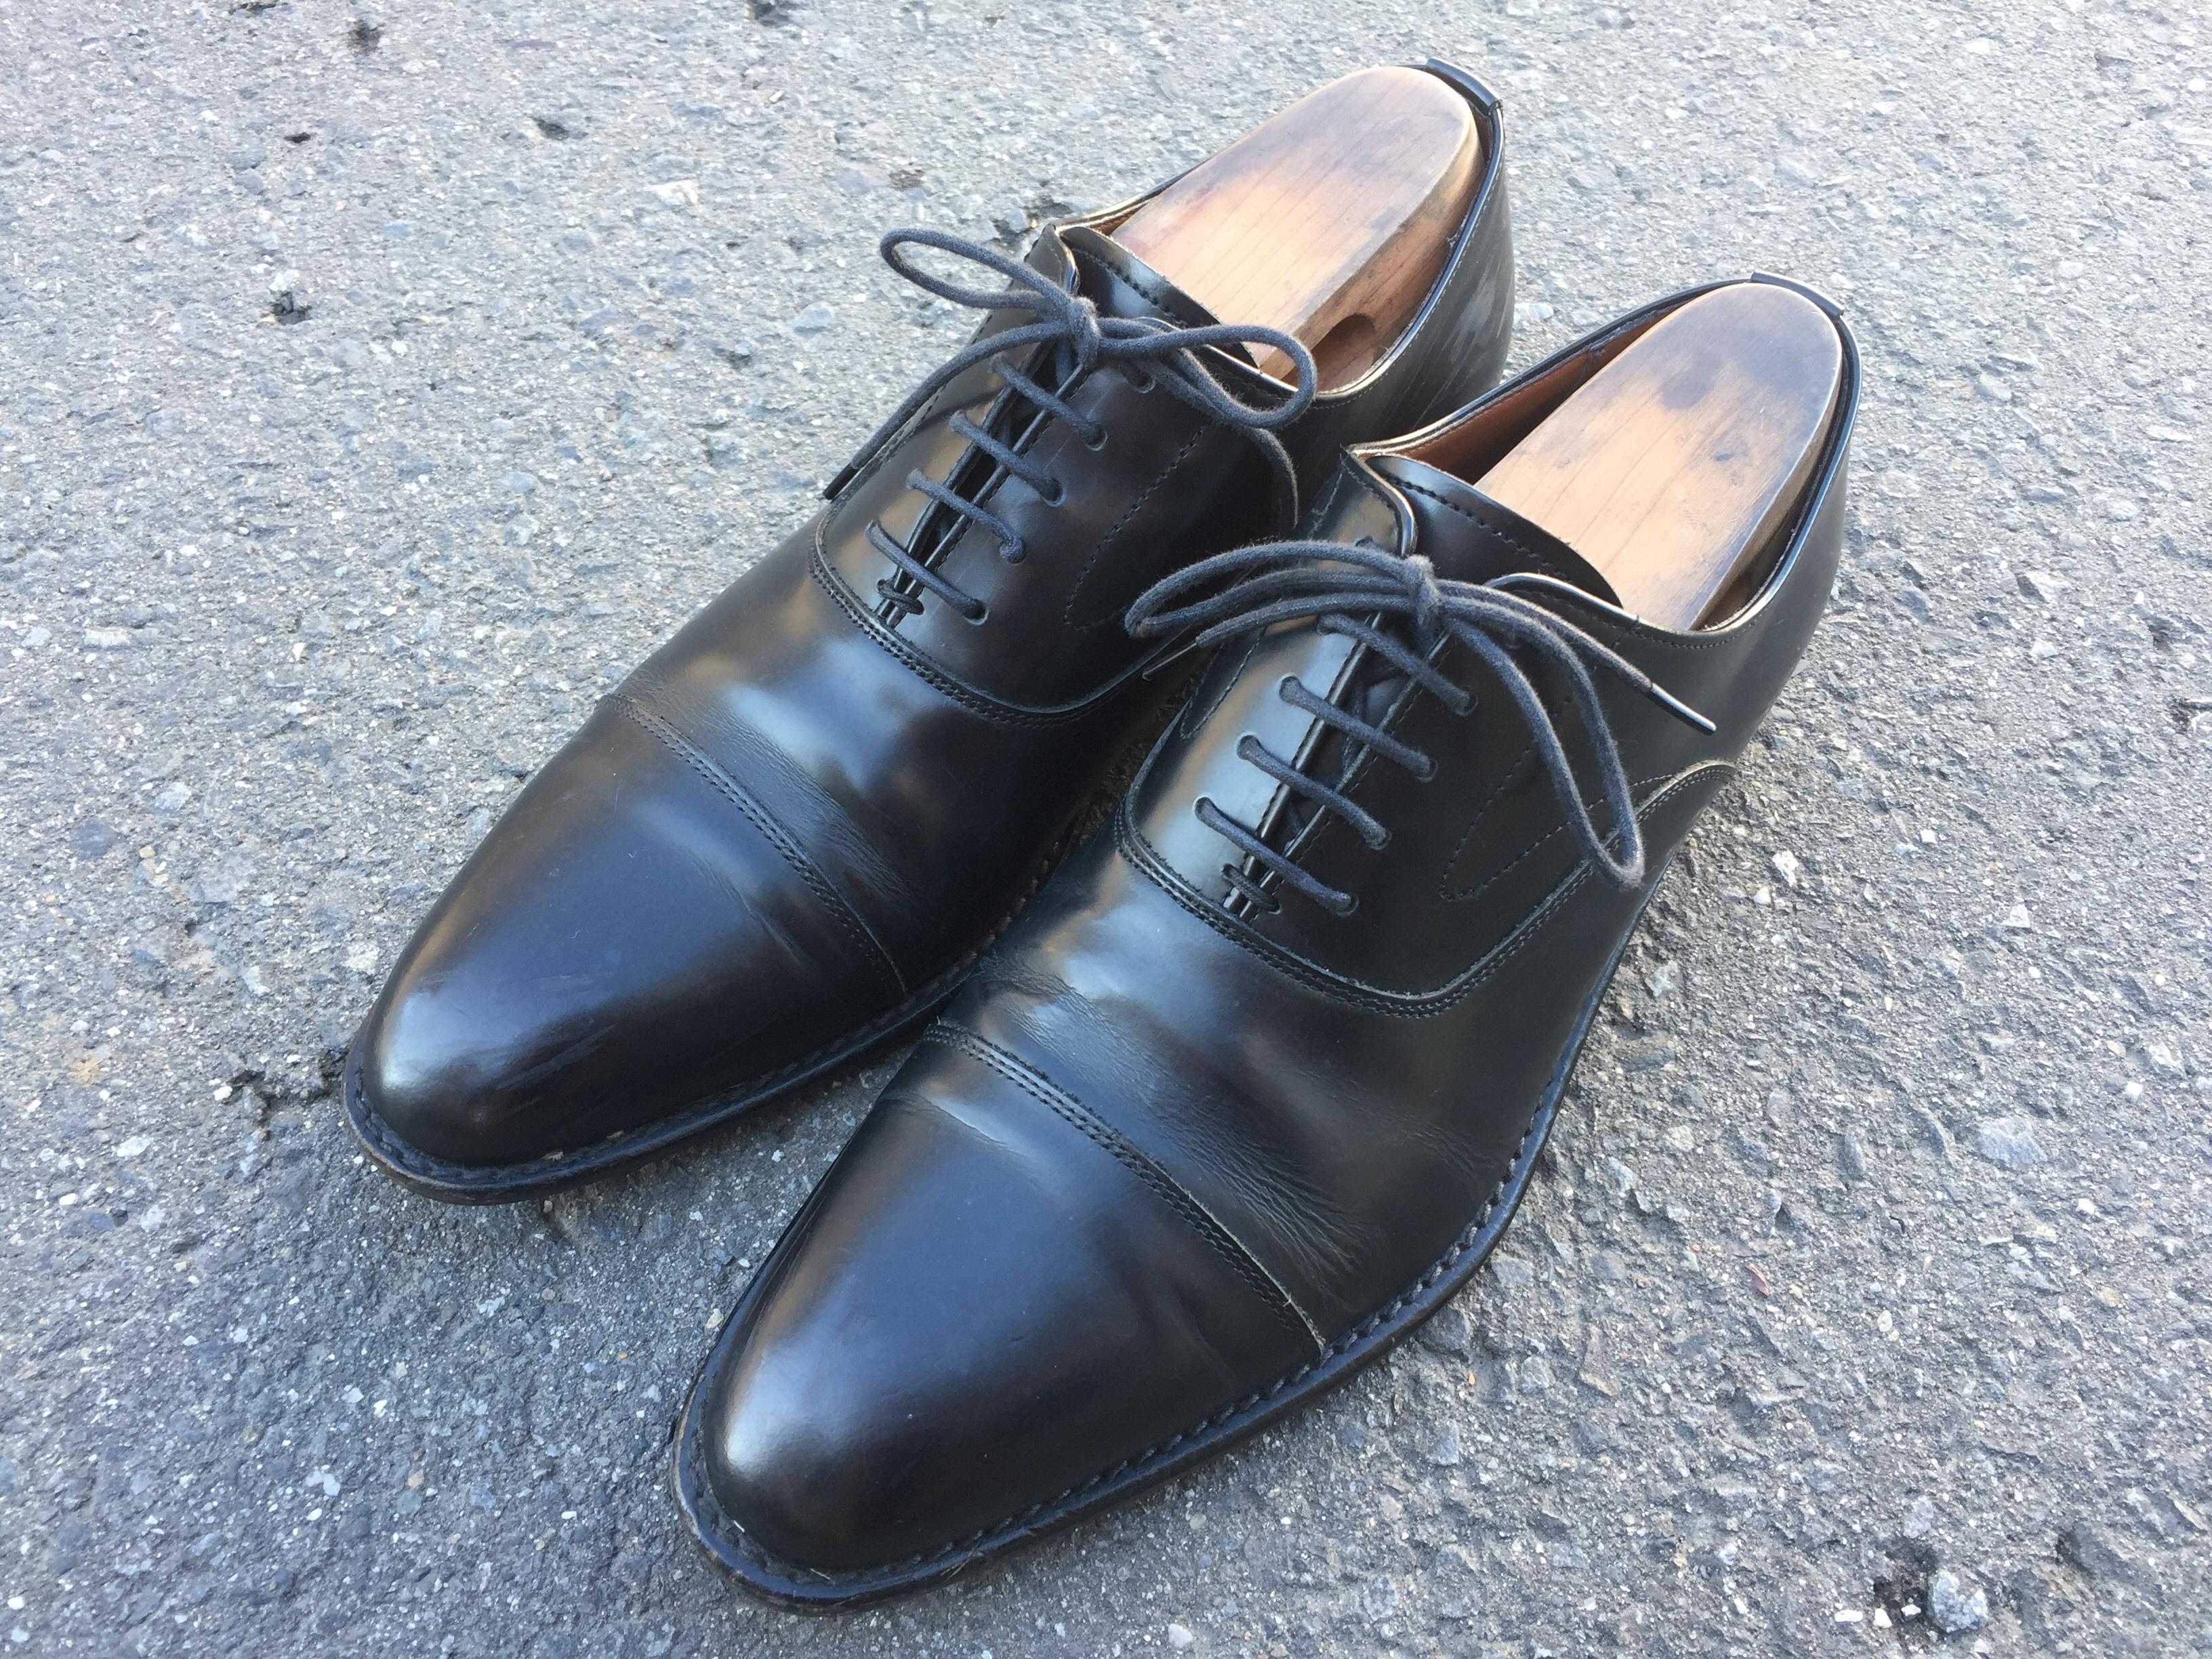 KENFORDの革靴は評判通りコスパ最強!あらゆる人におすすめ